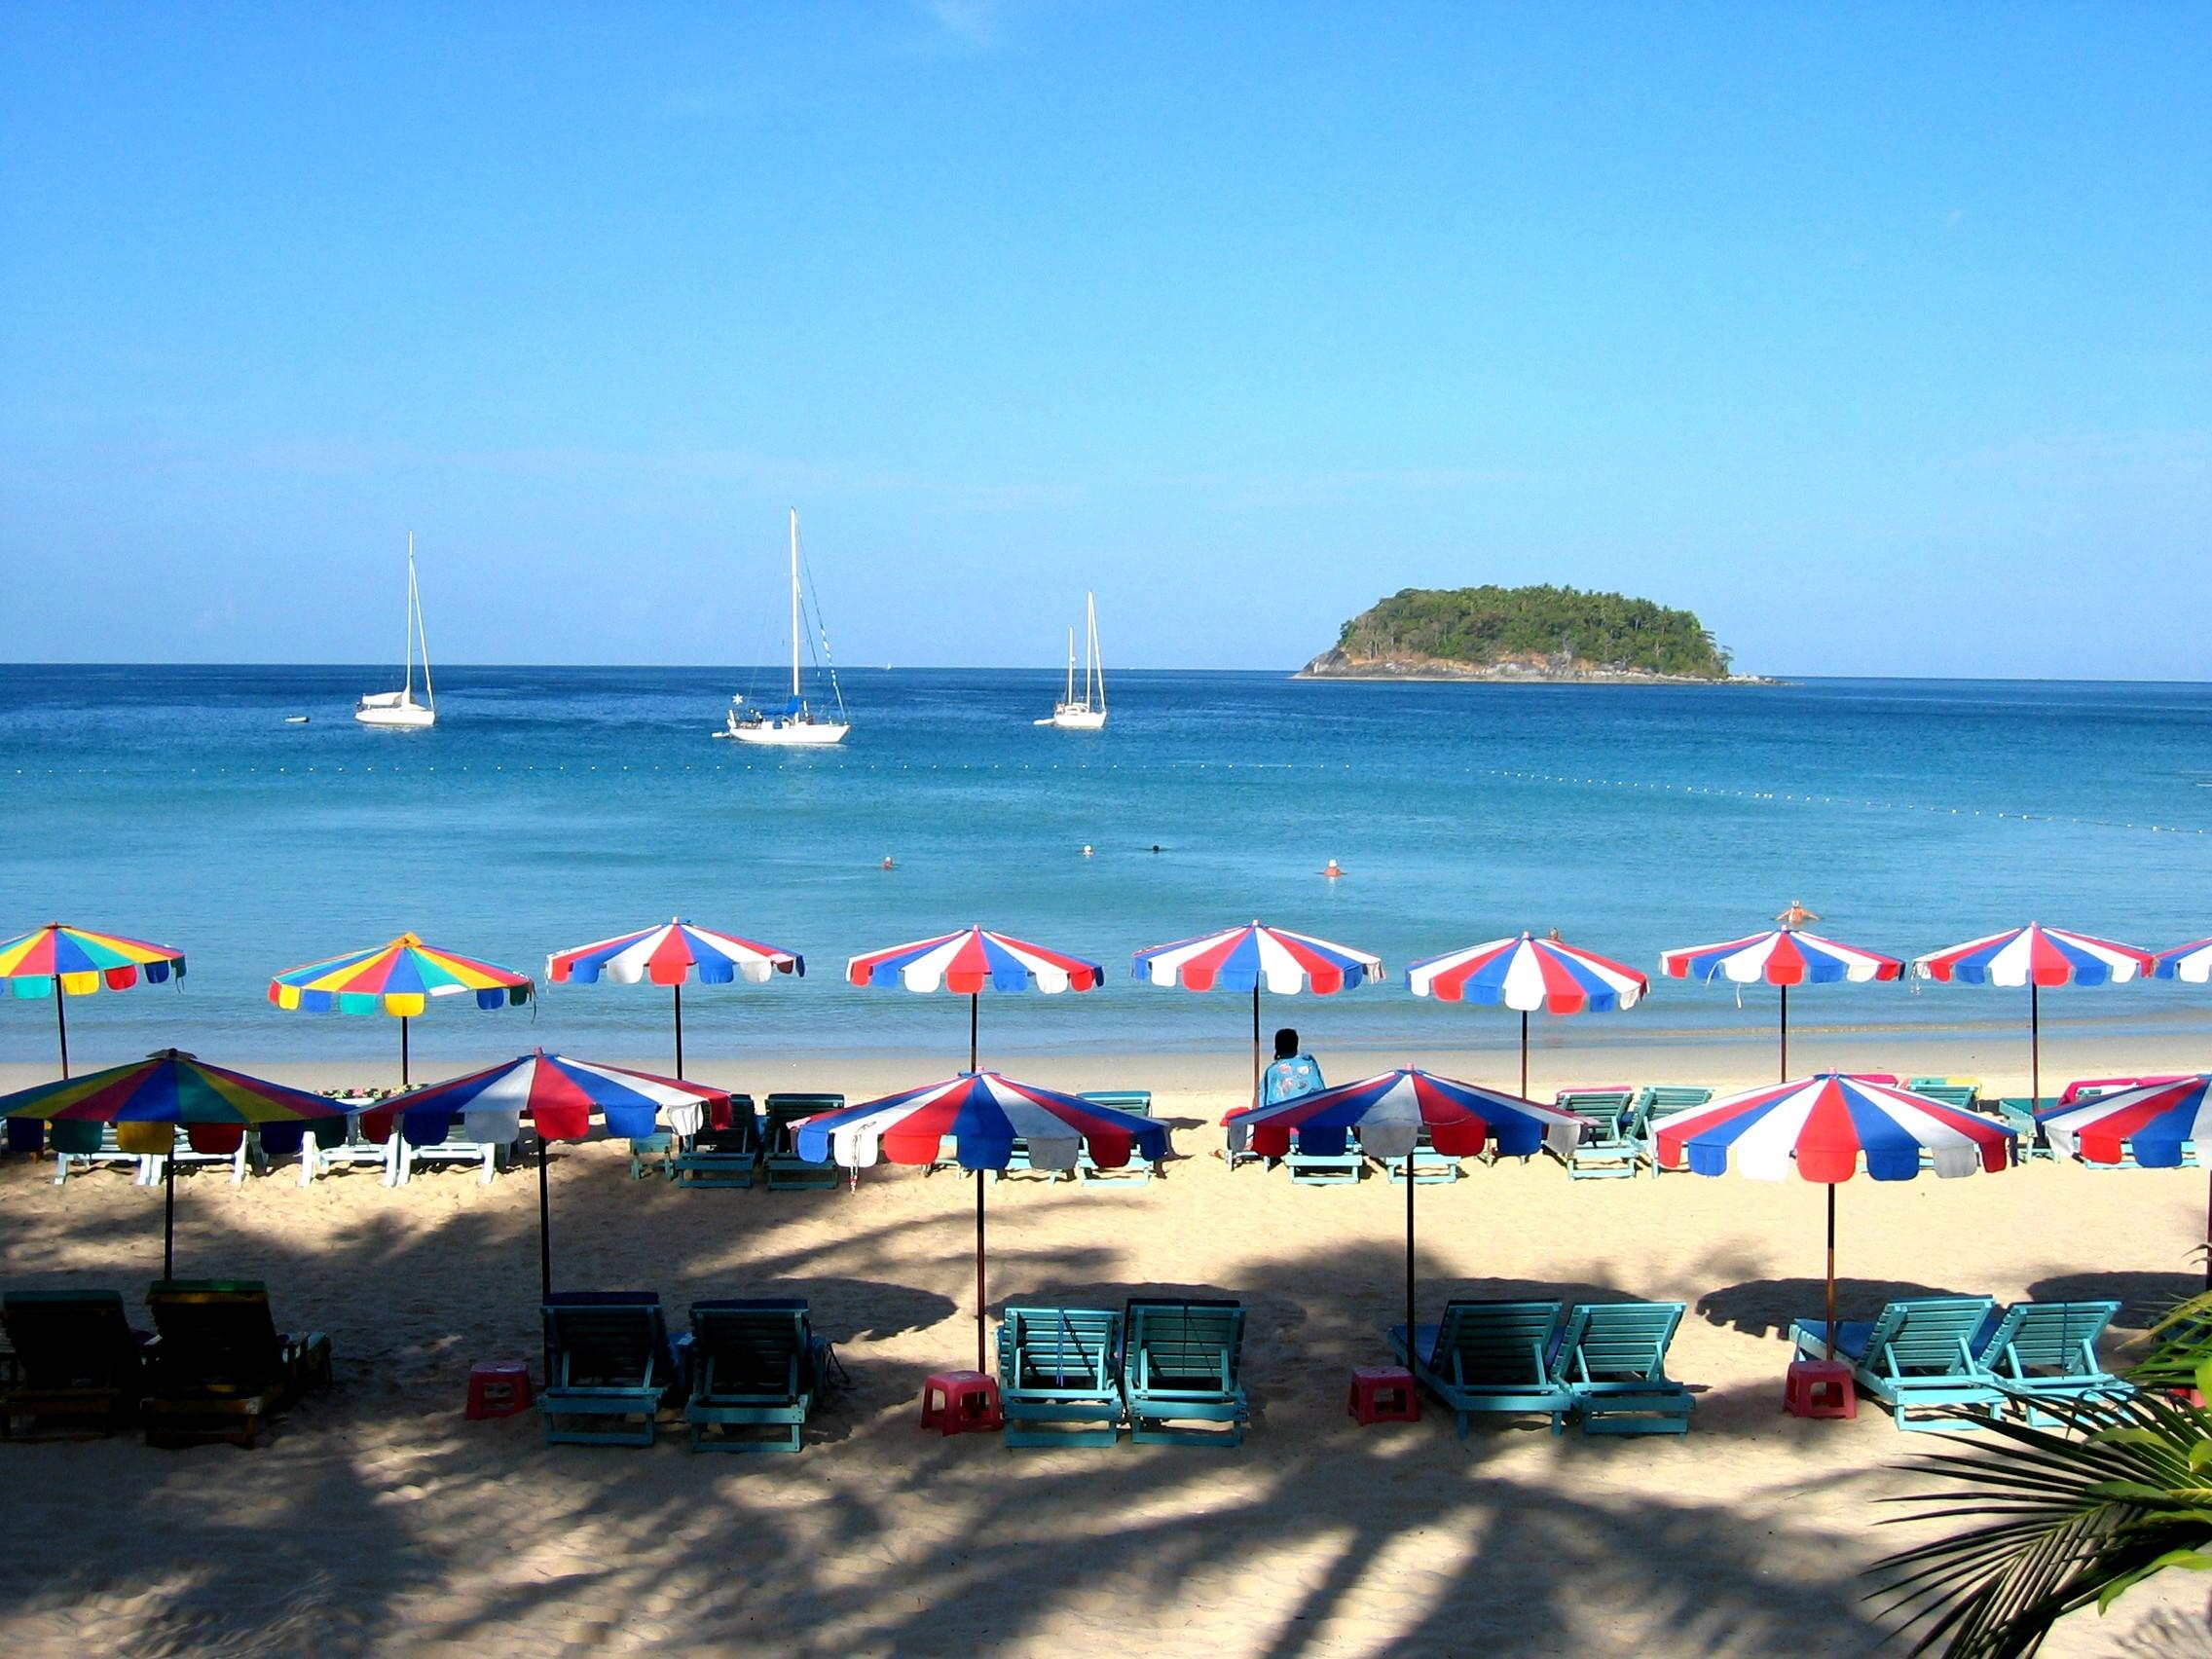 Of tourism authority of thailand, phuket office, said that tourism